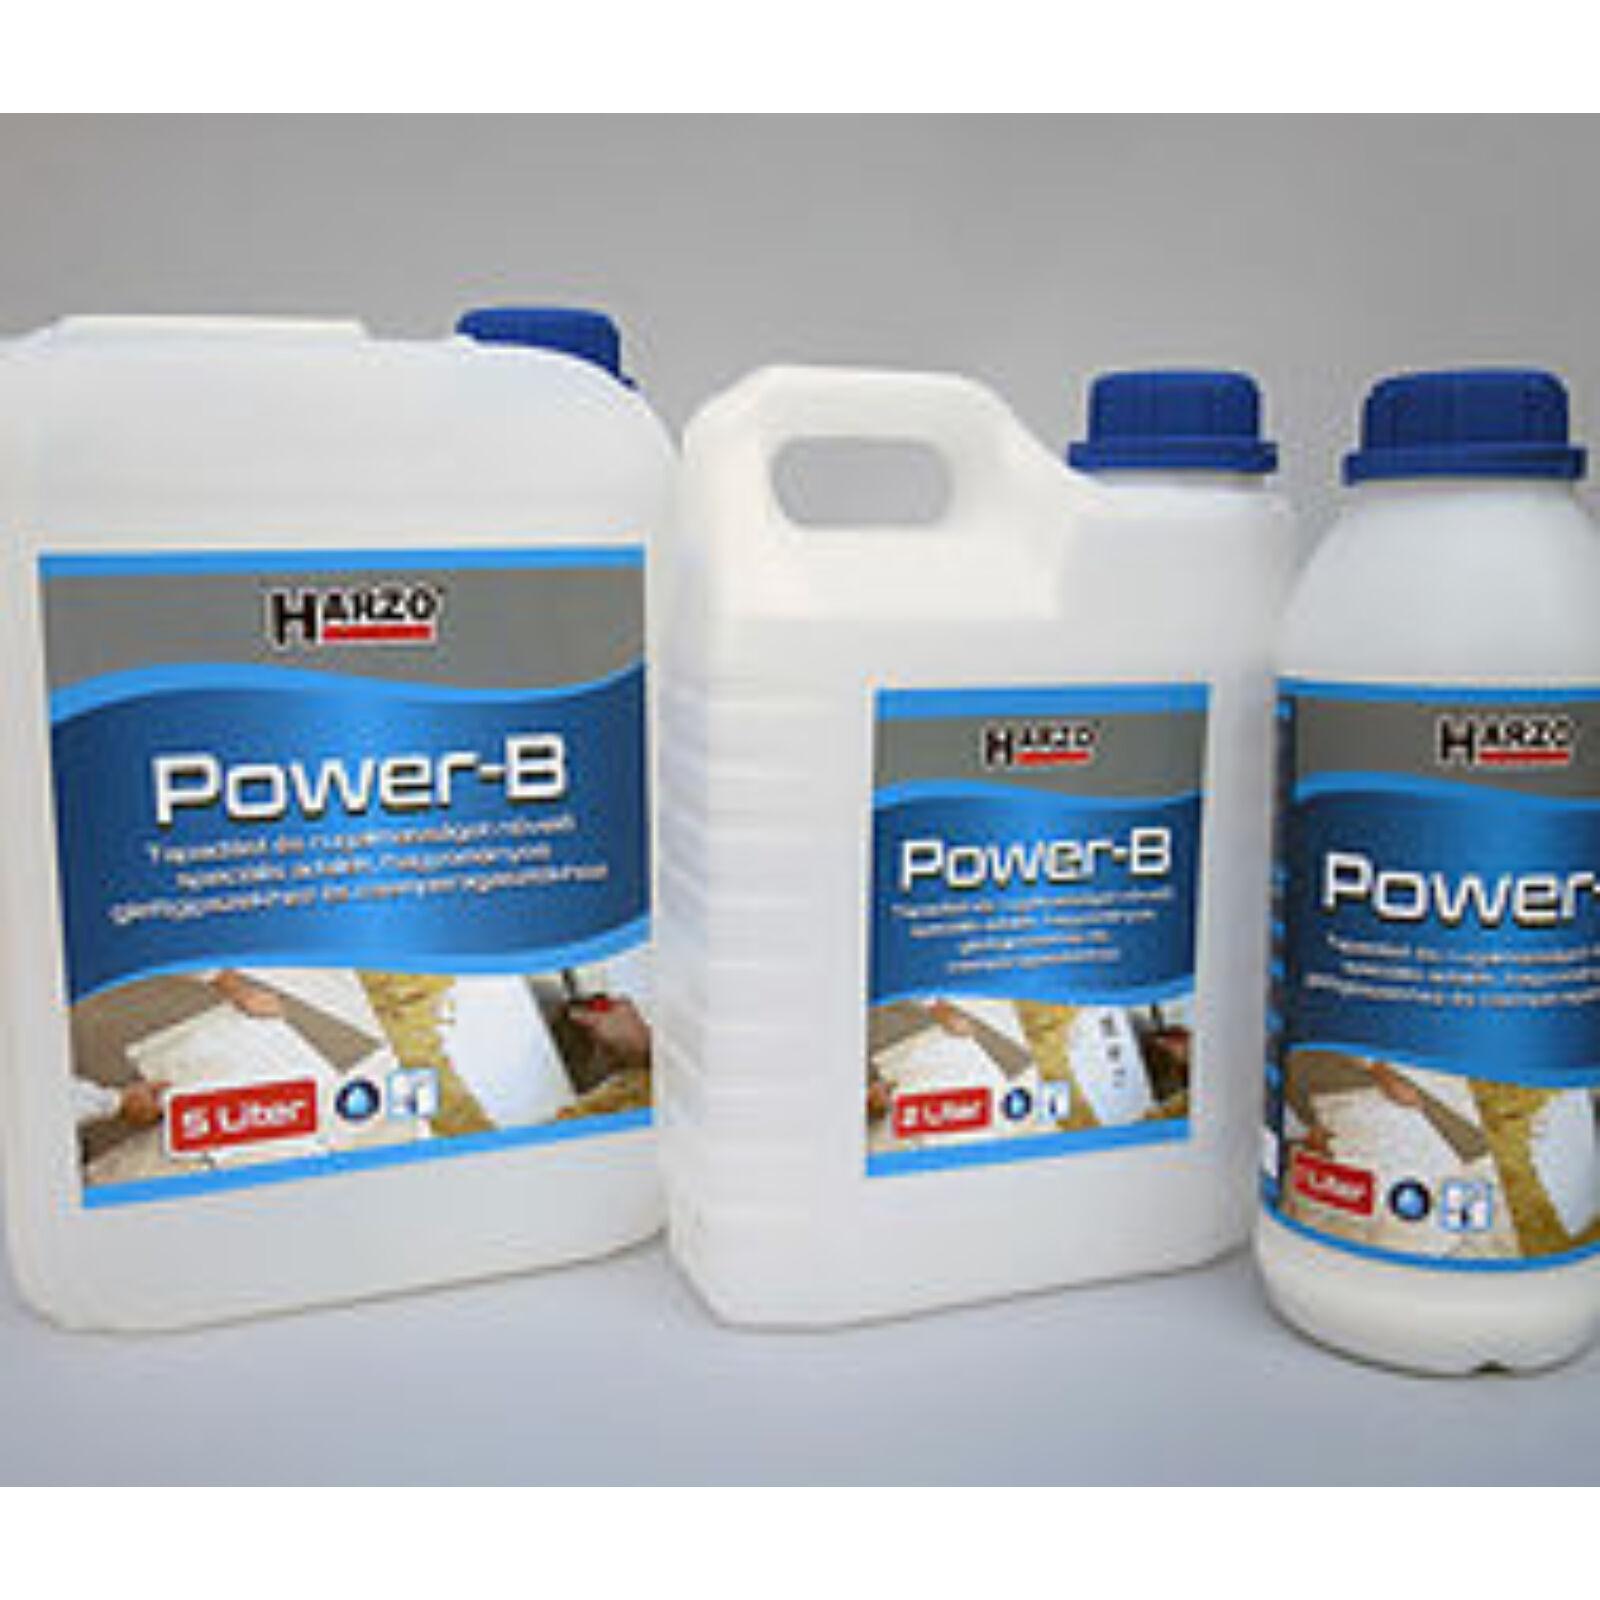 HARZO Power – B speciális adalék [5 l]